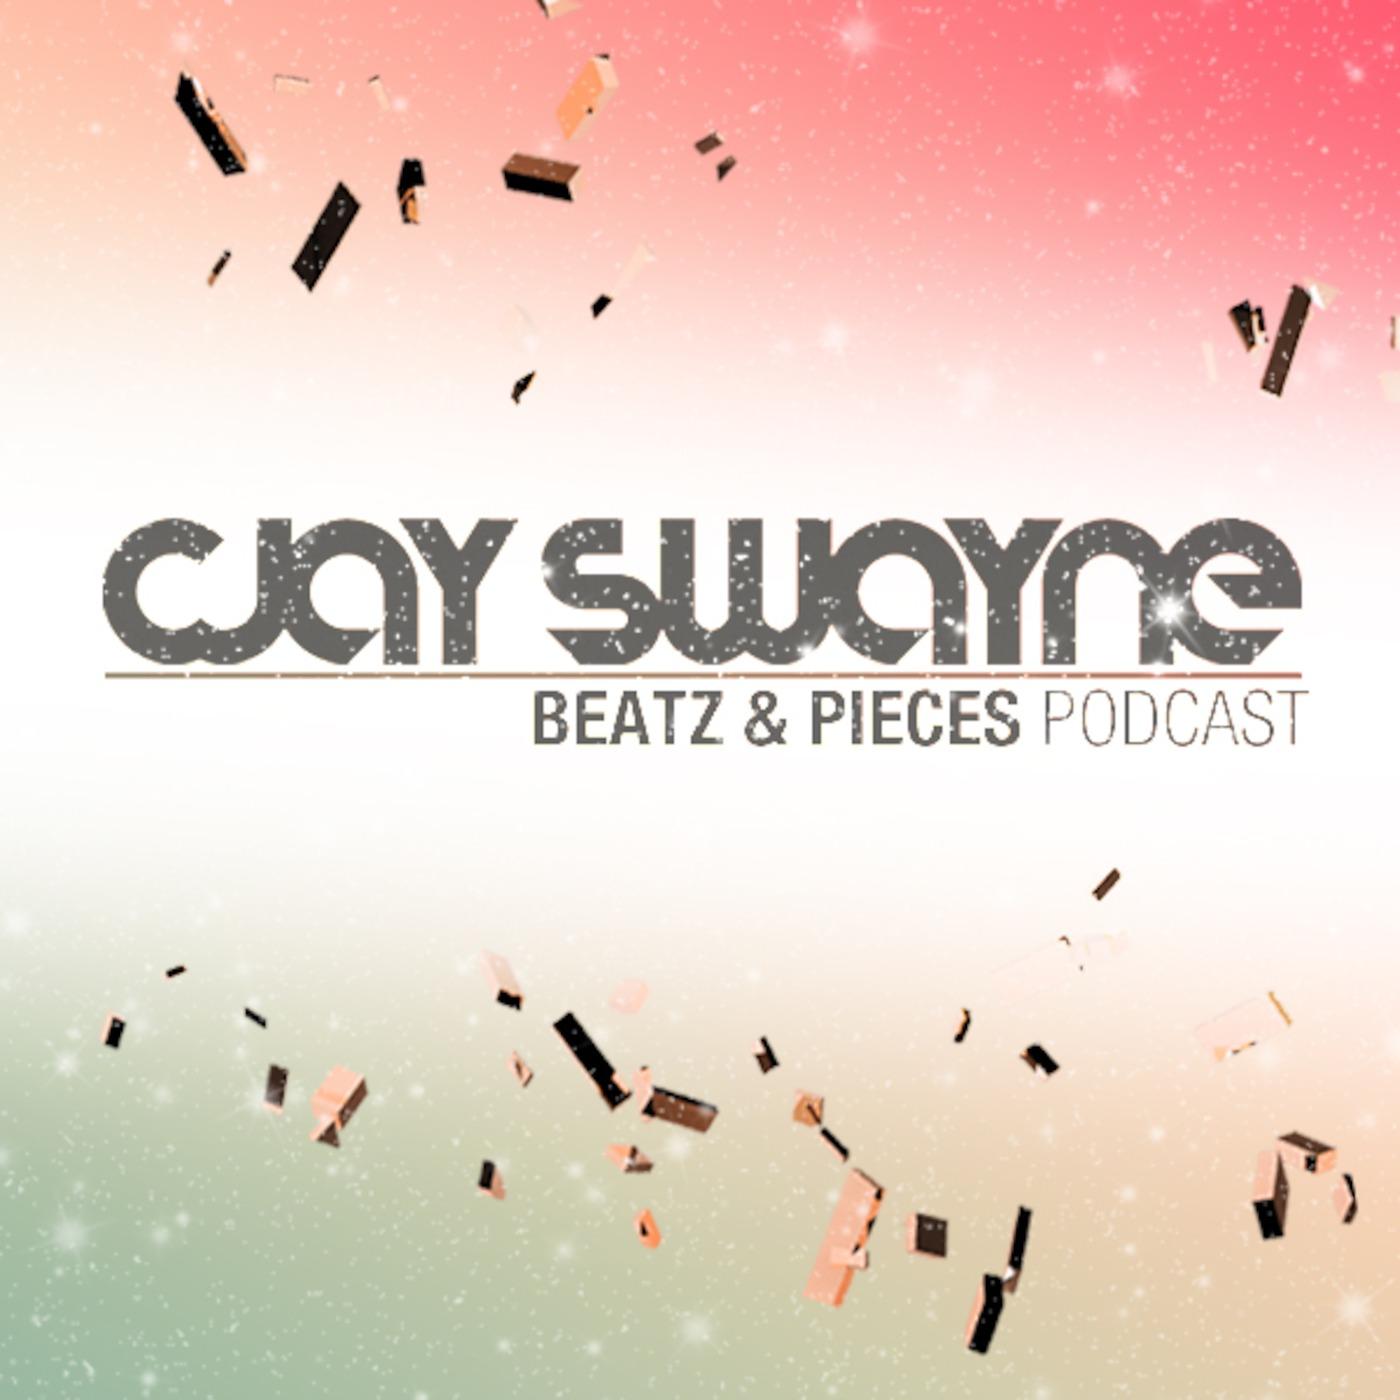 CJay Swayne's Beatz & Pieces Podcast